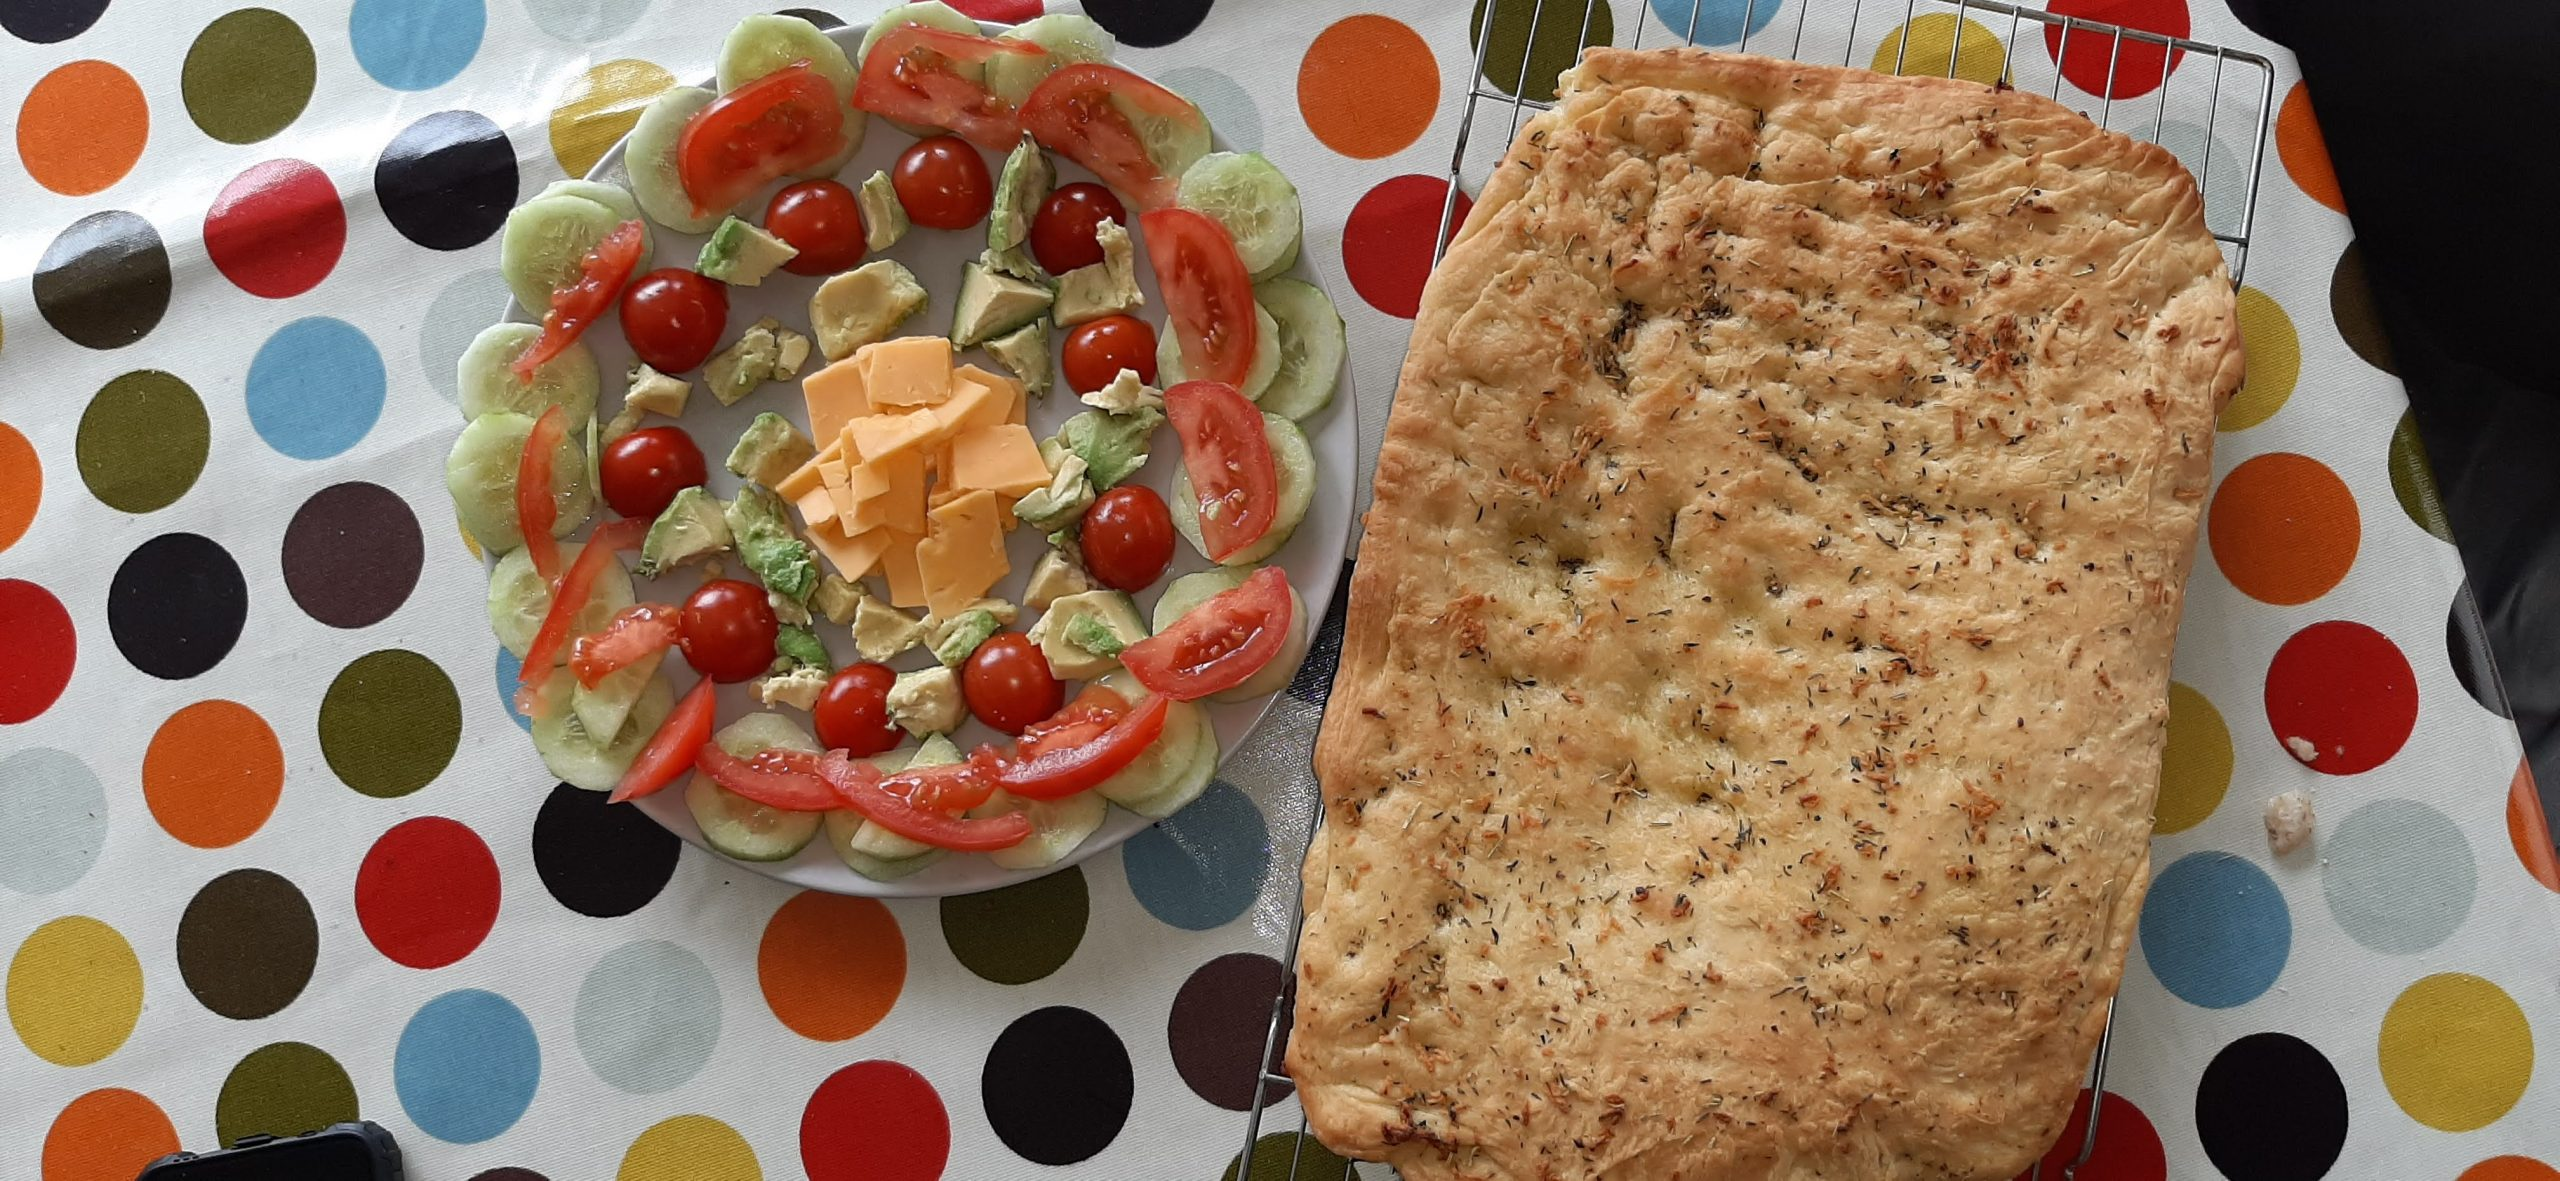 Garlic, Rosemary and Thyme Foccacia Bread Recipe